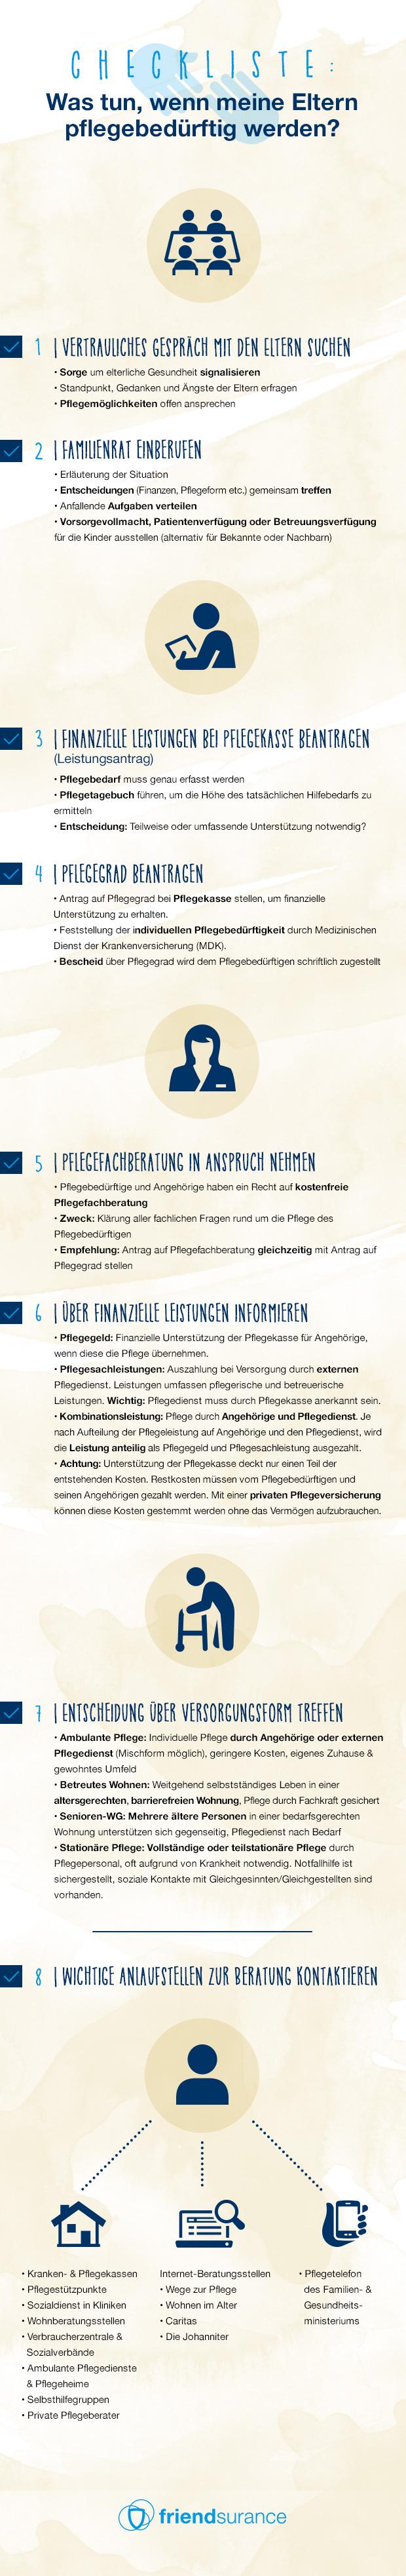 Infographik Private Krankenversicherung - apotheken-wissen.de